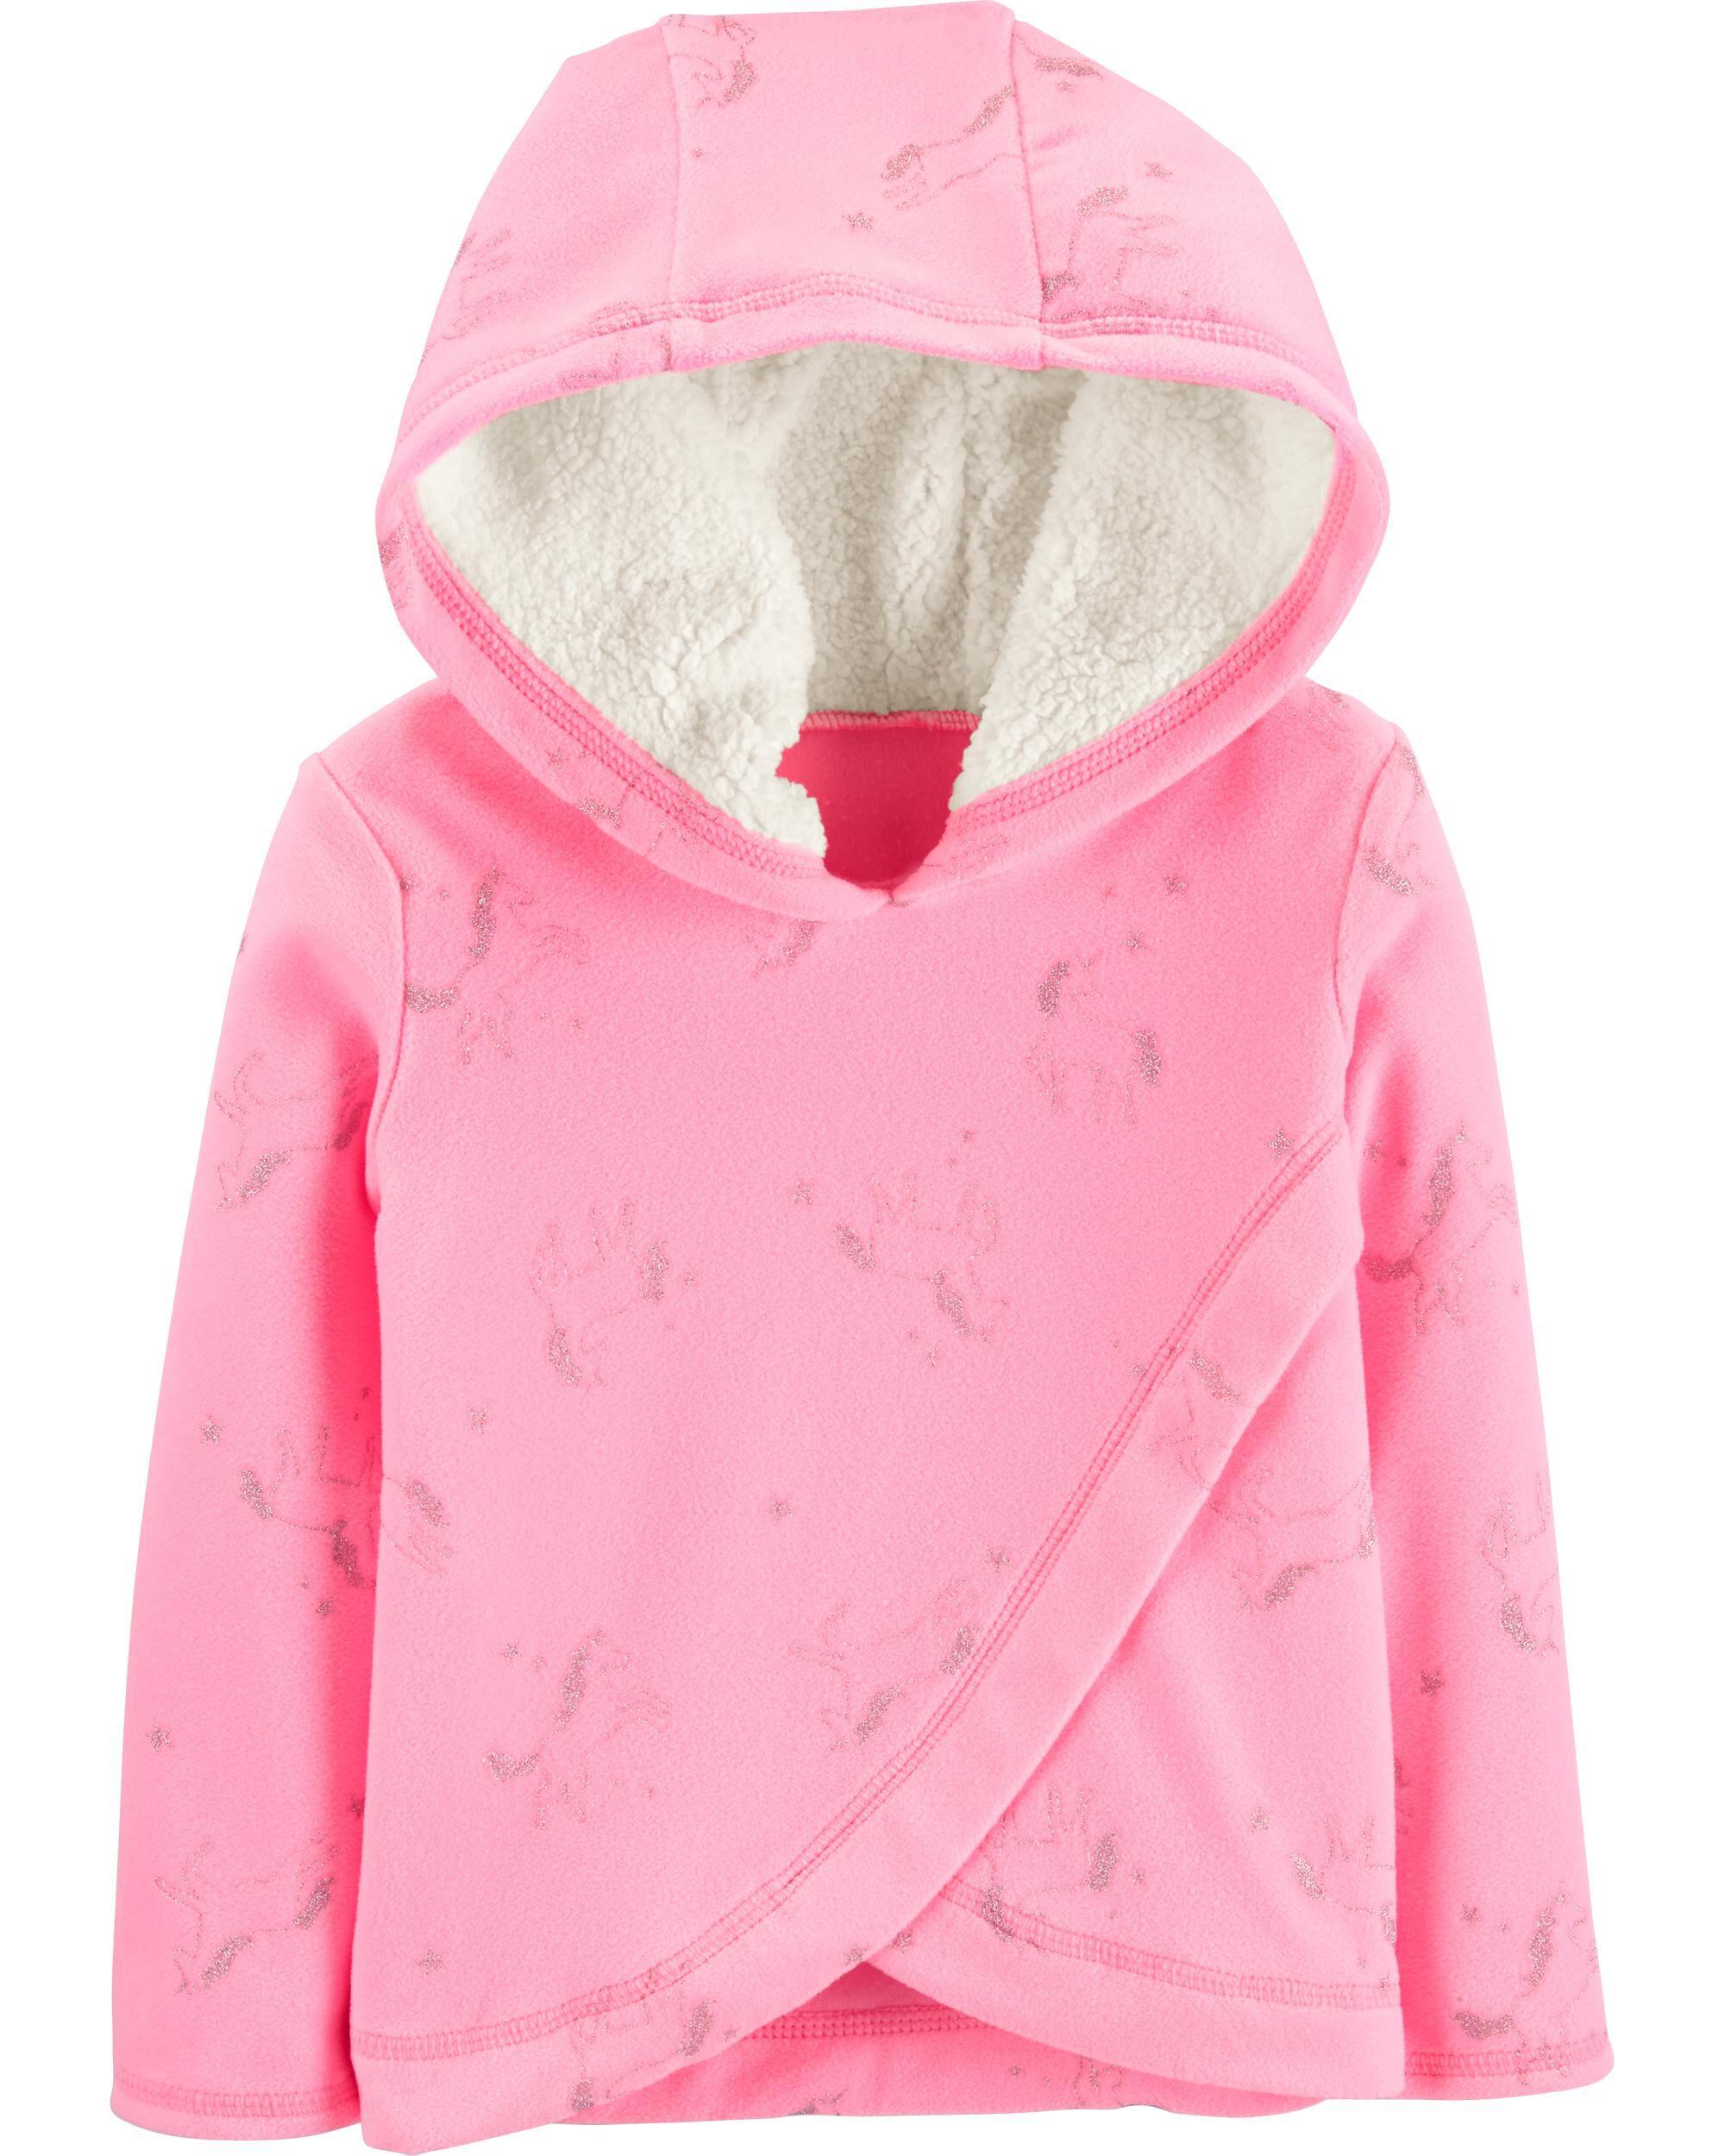 Carters Micro Fleece Jumper Bright Pink-24M